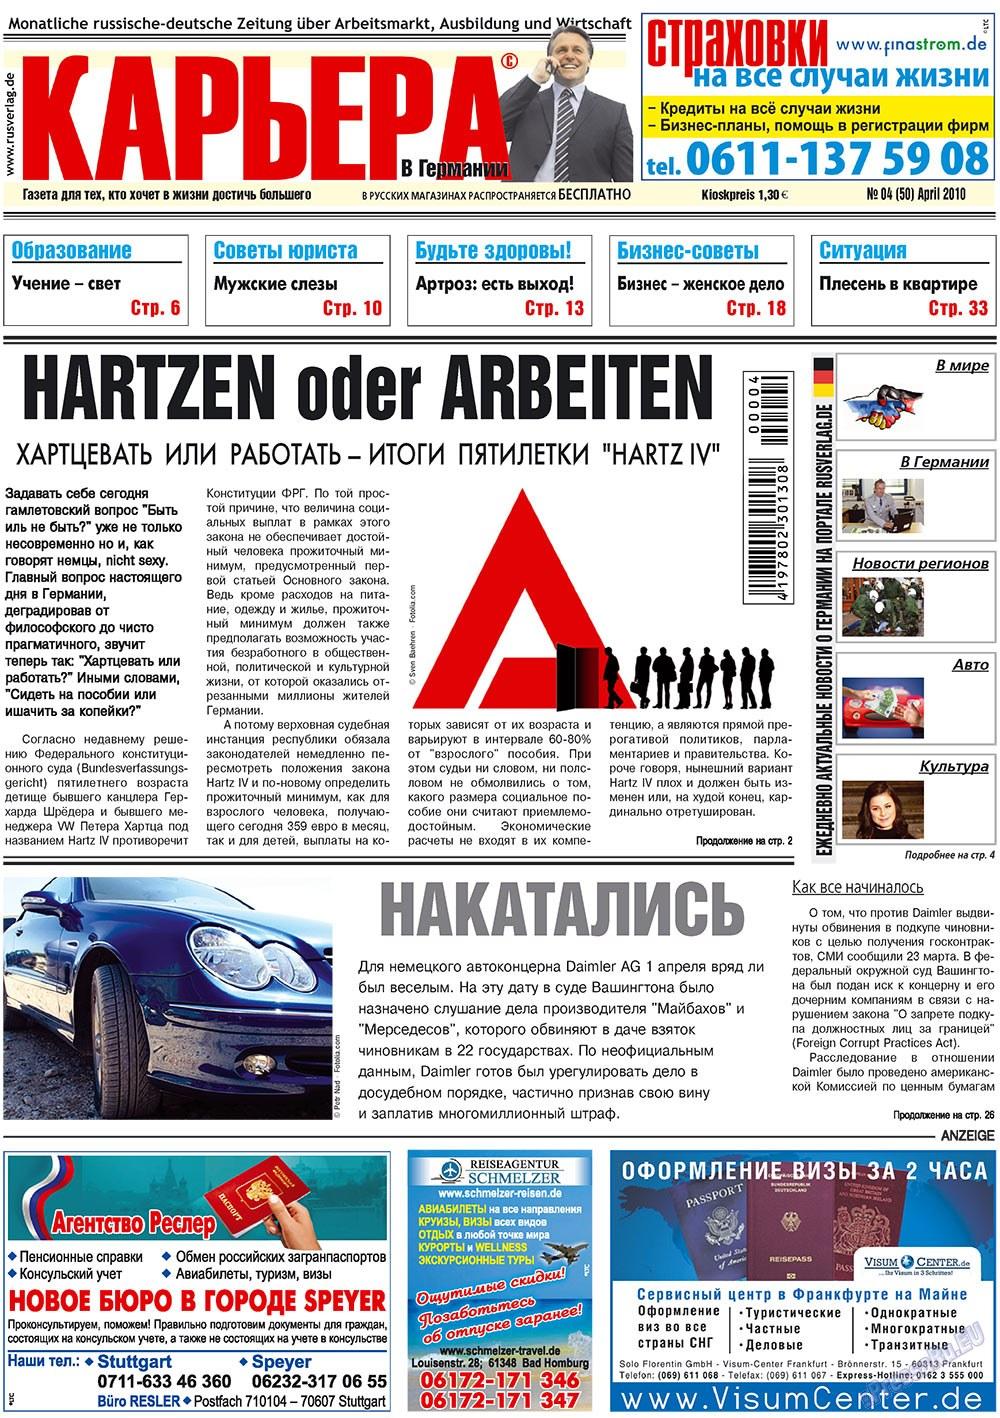 Карьера (газета). 2010 год, номер 4, стр. 1